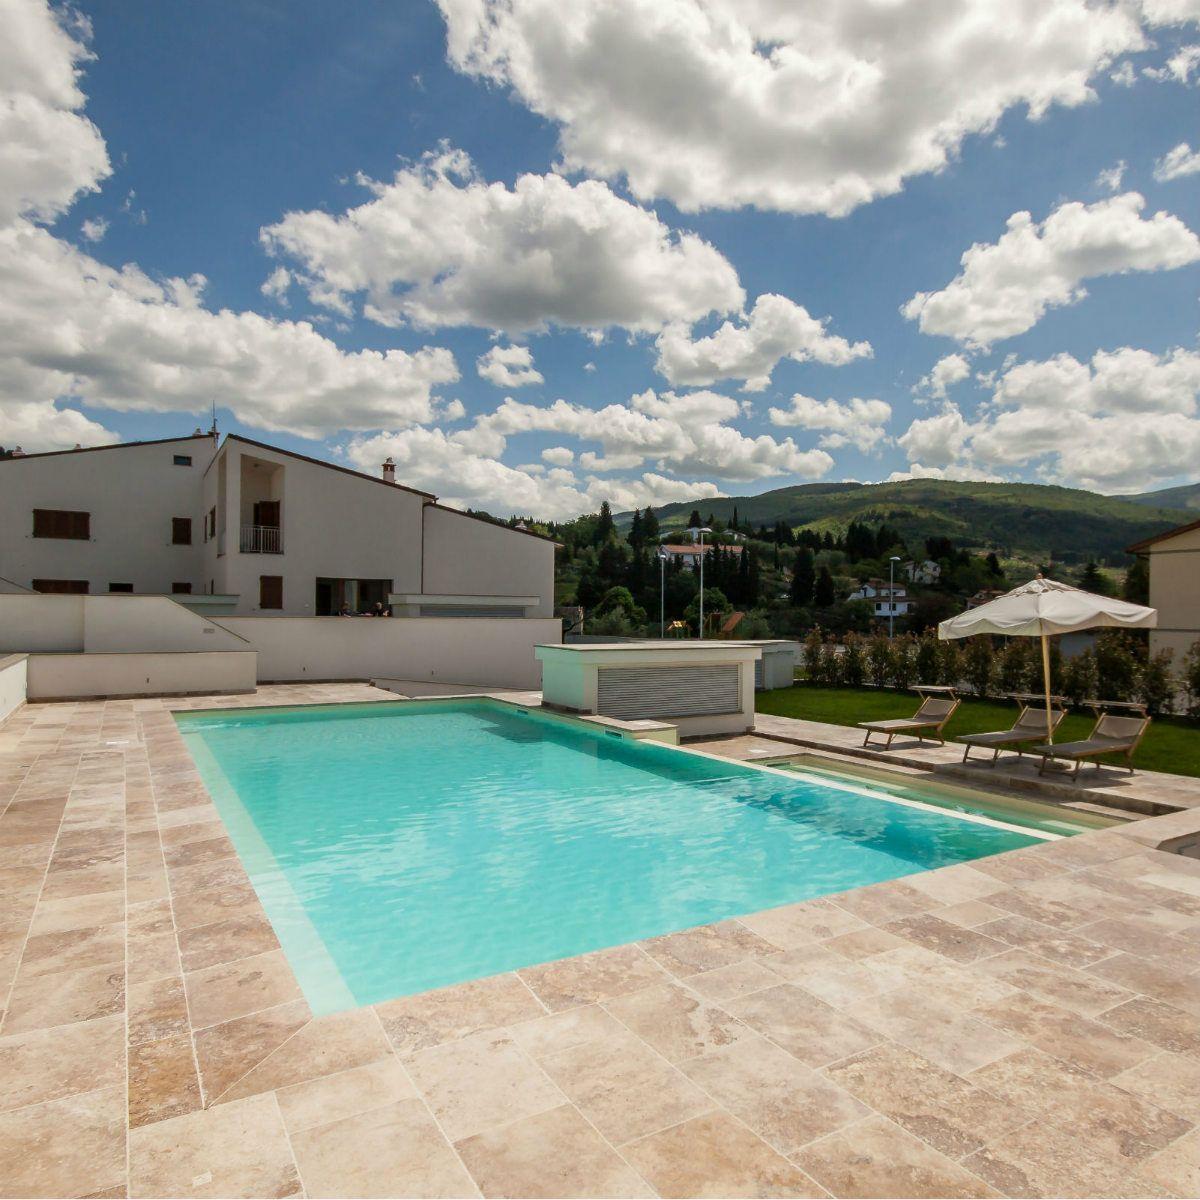 Swimming Pool Umrandung piscina in travertino per resort in toscana pool umrandung stein